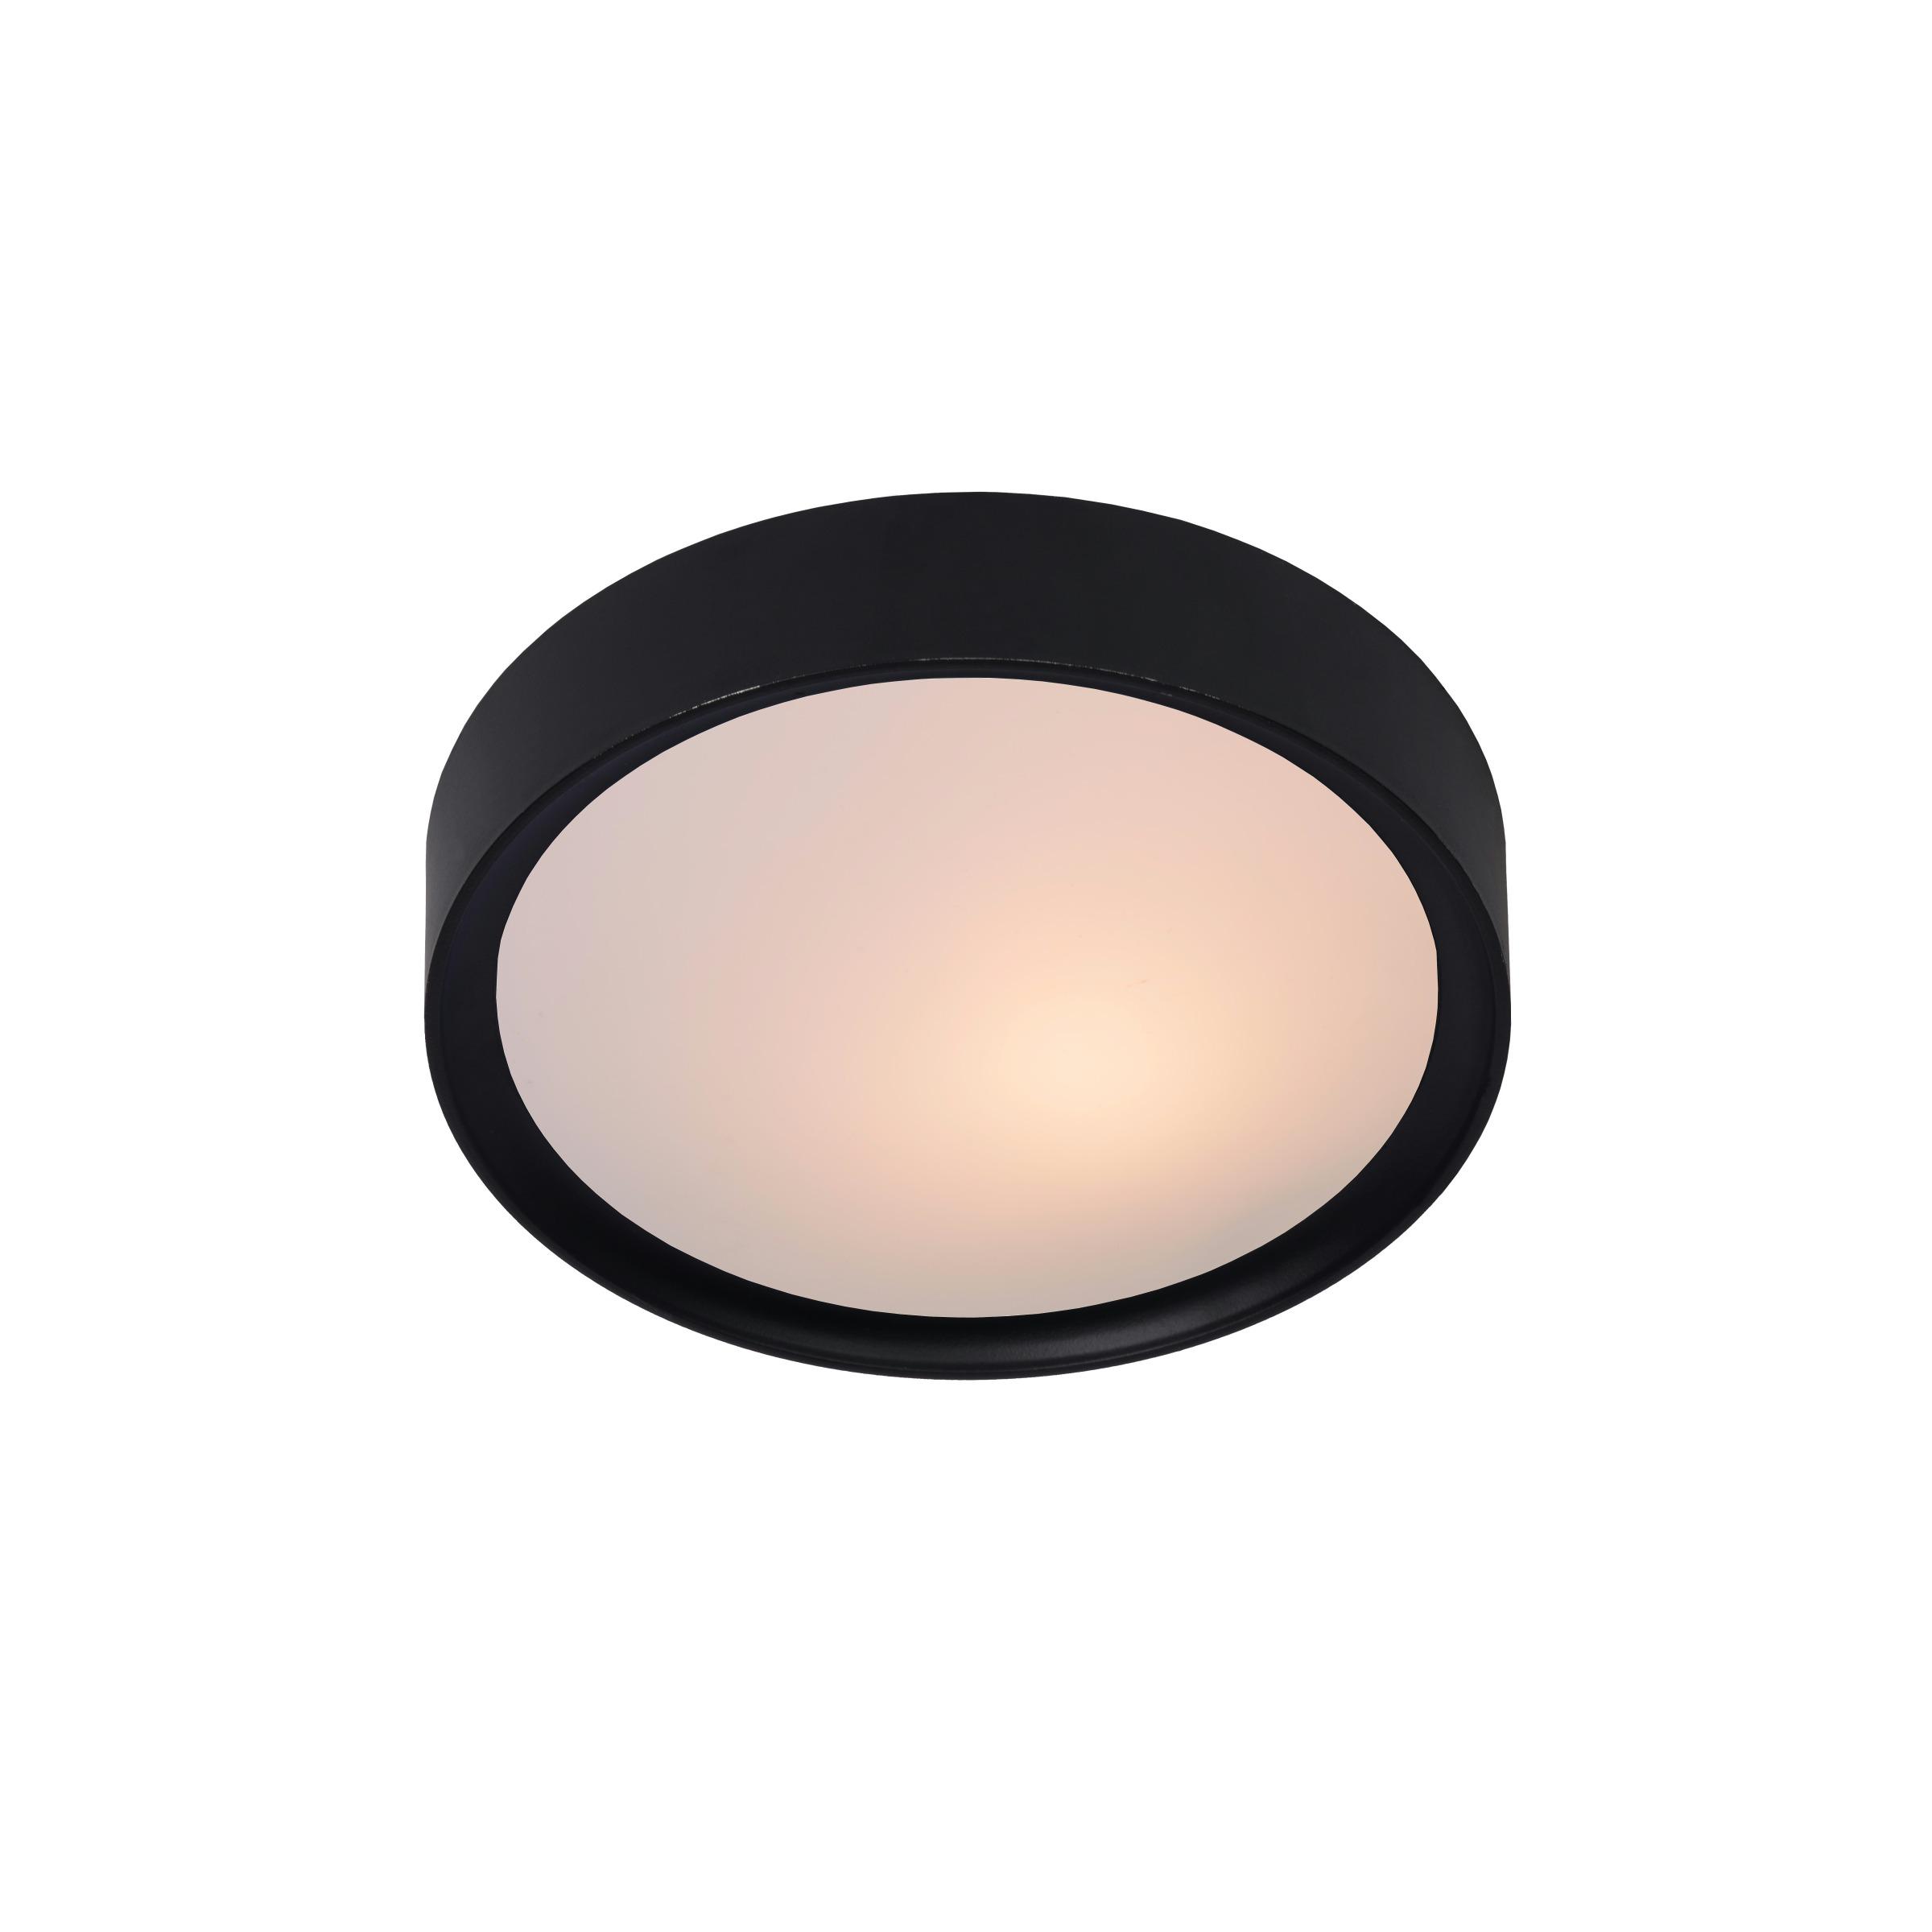 LEX Plafondlamp by Lucide 08109-01-30